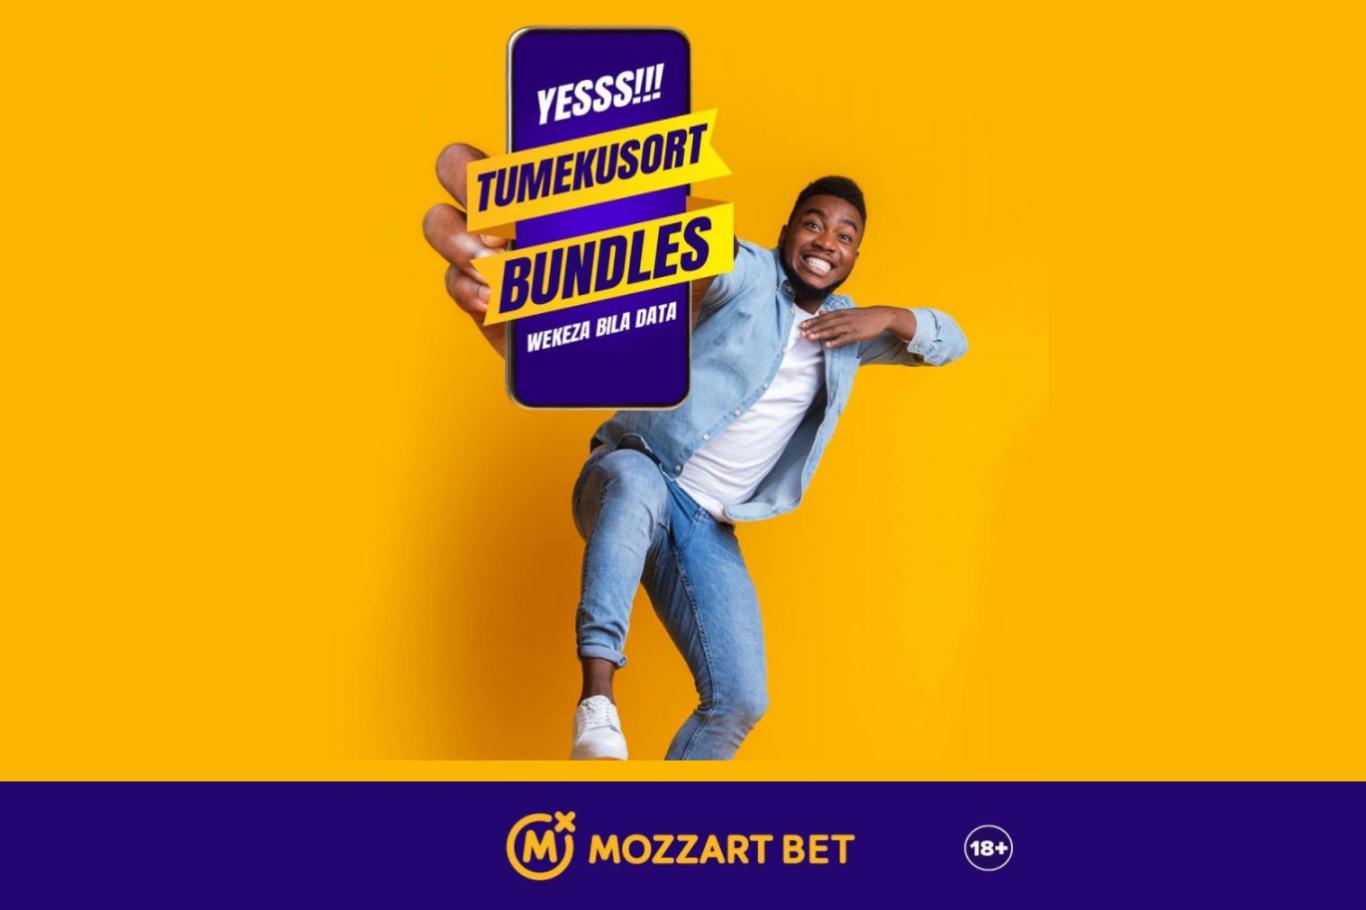 MozzartBet Kenya promotions and bonuses